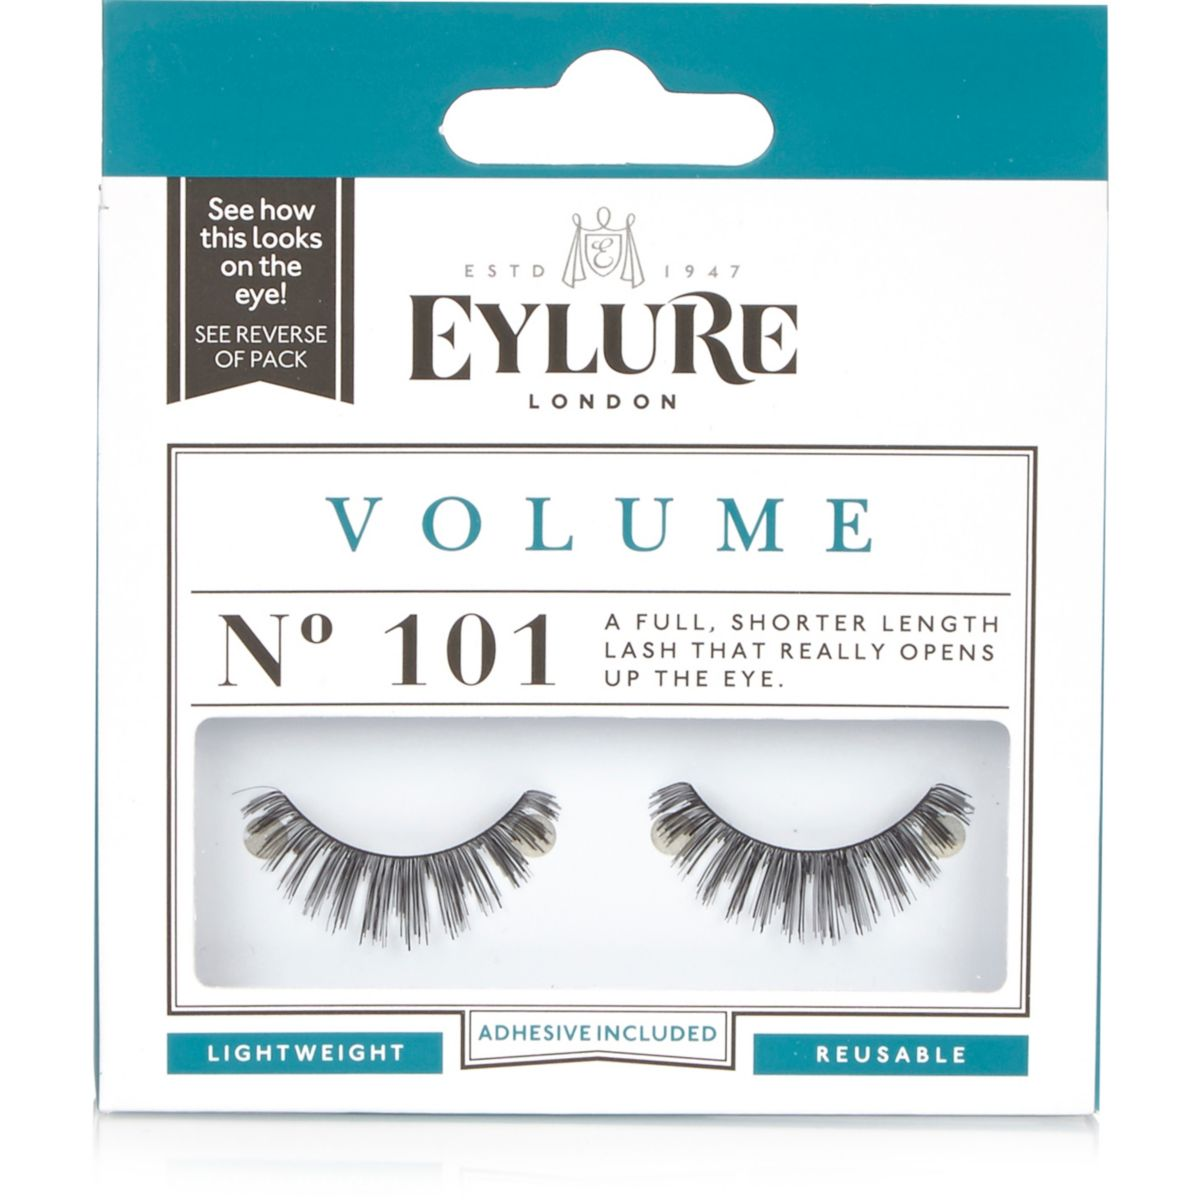 Eylure volume 101 eyelashes